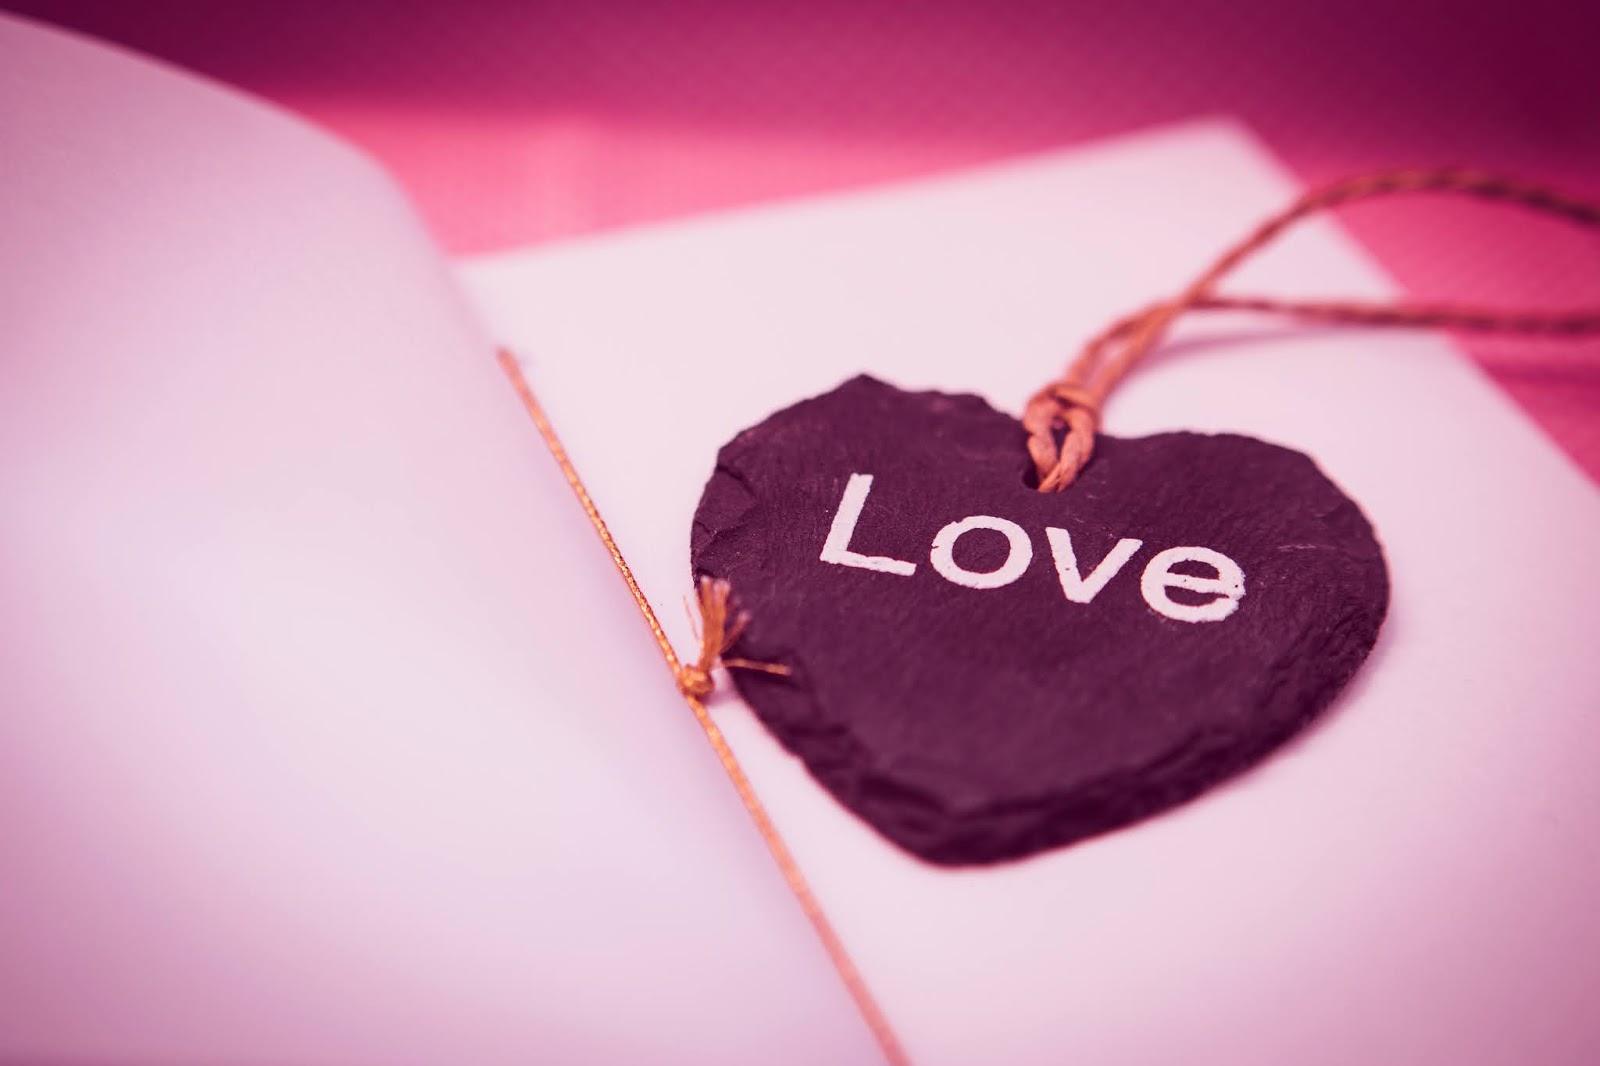 Love Pendant Necklace, love images